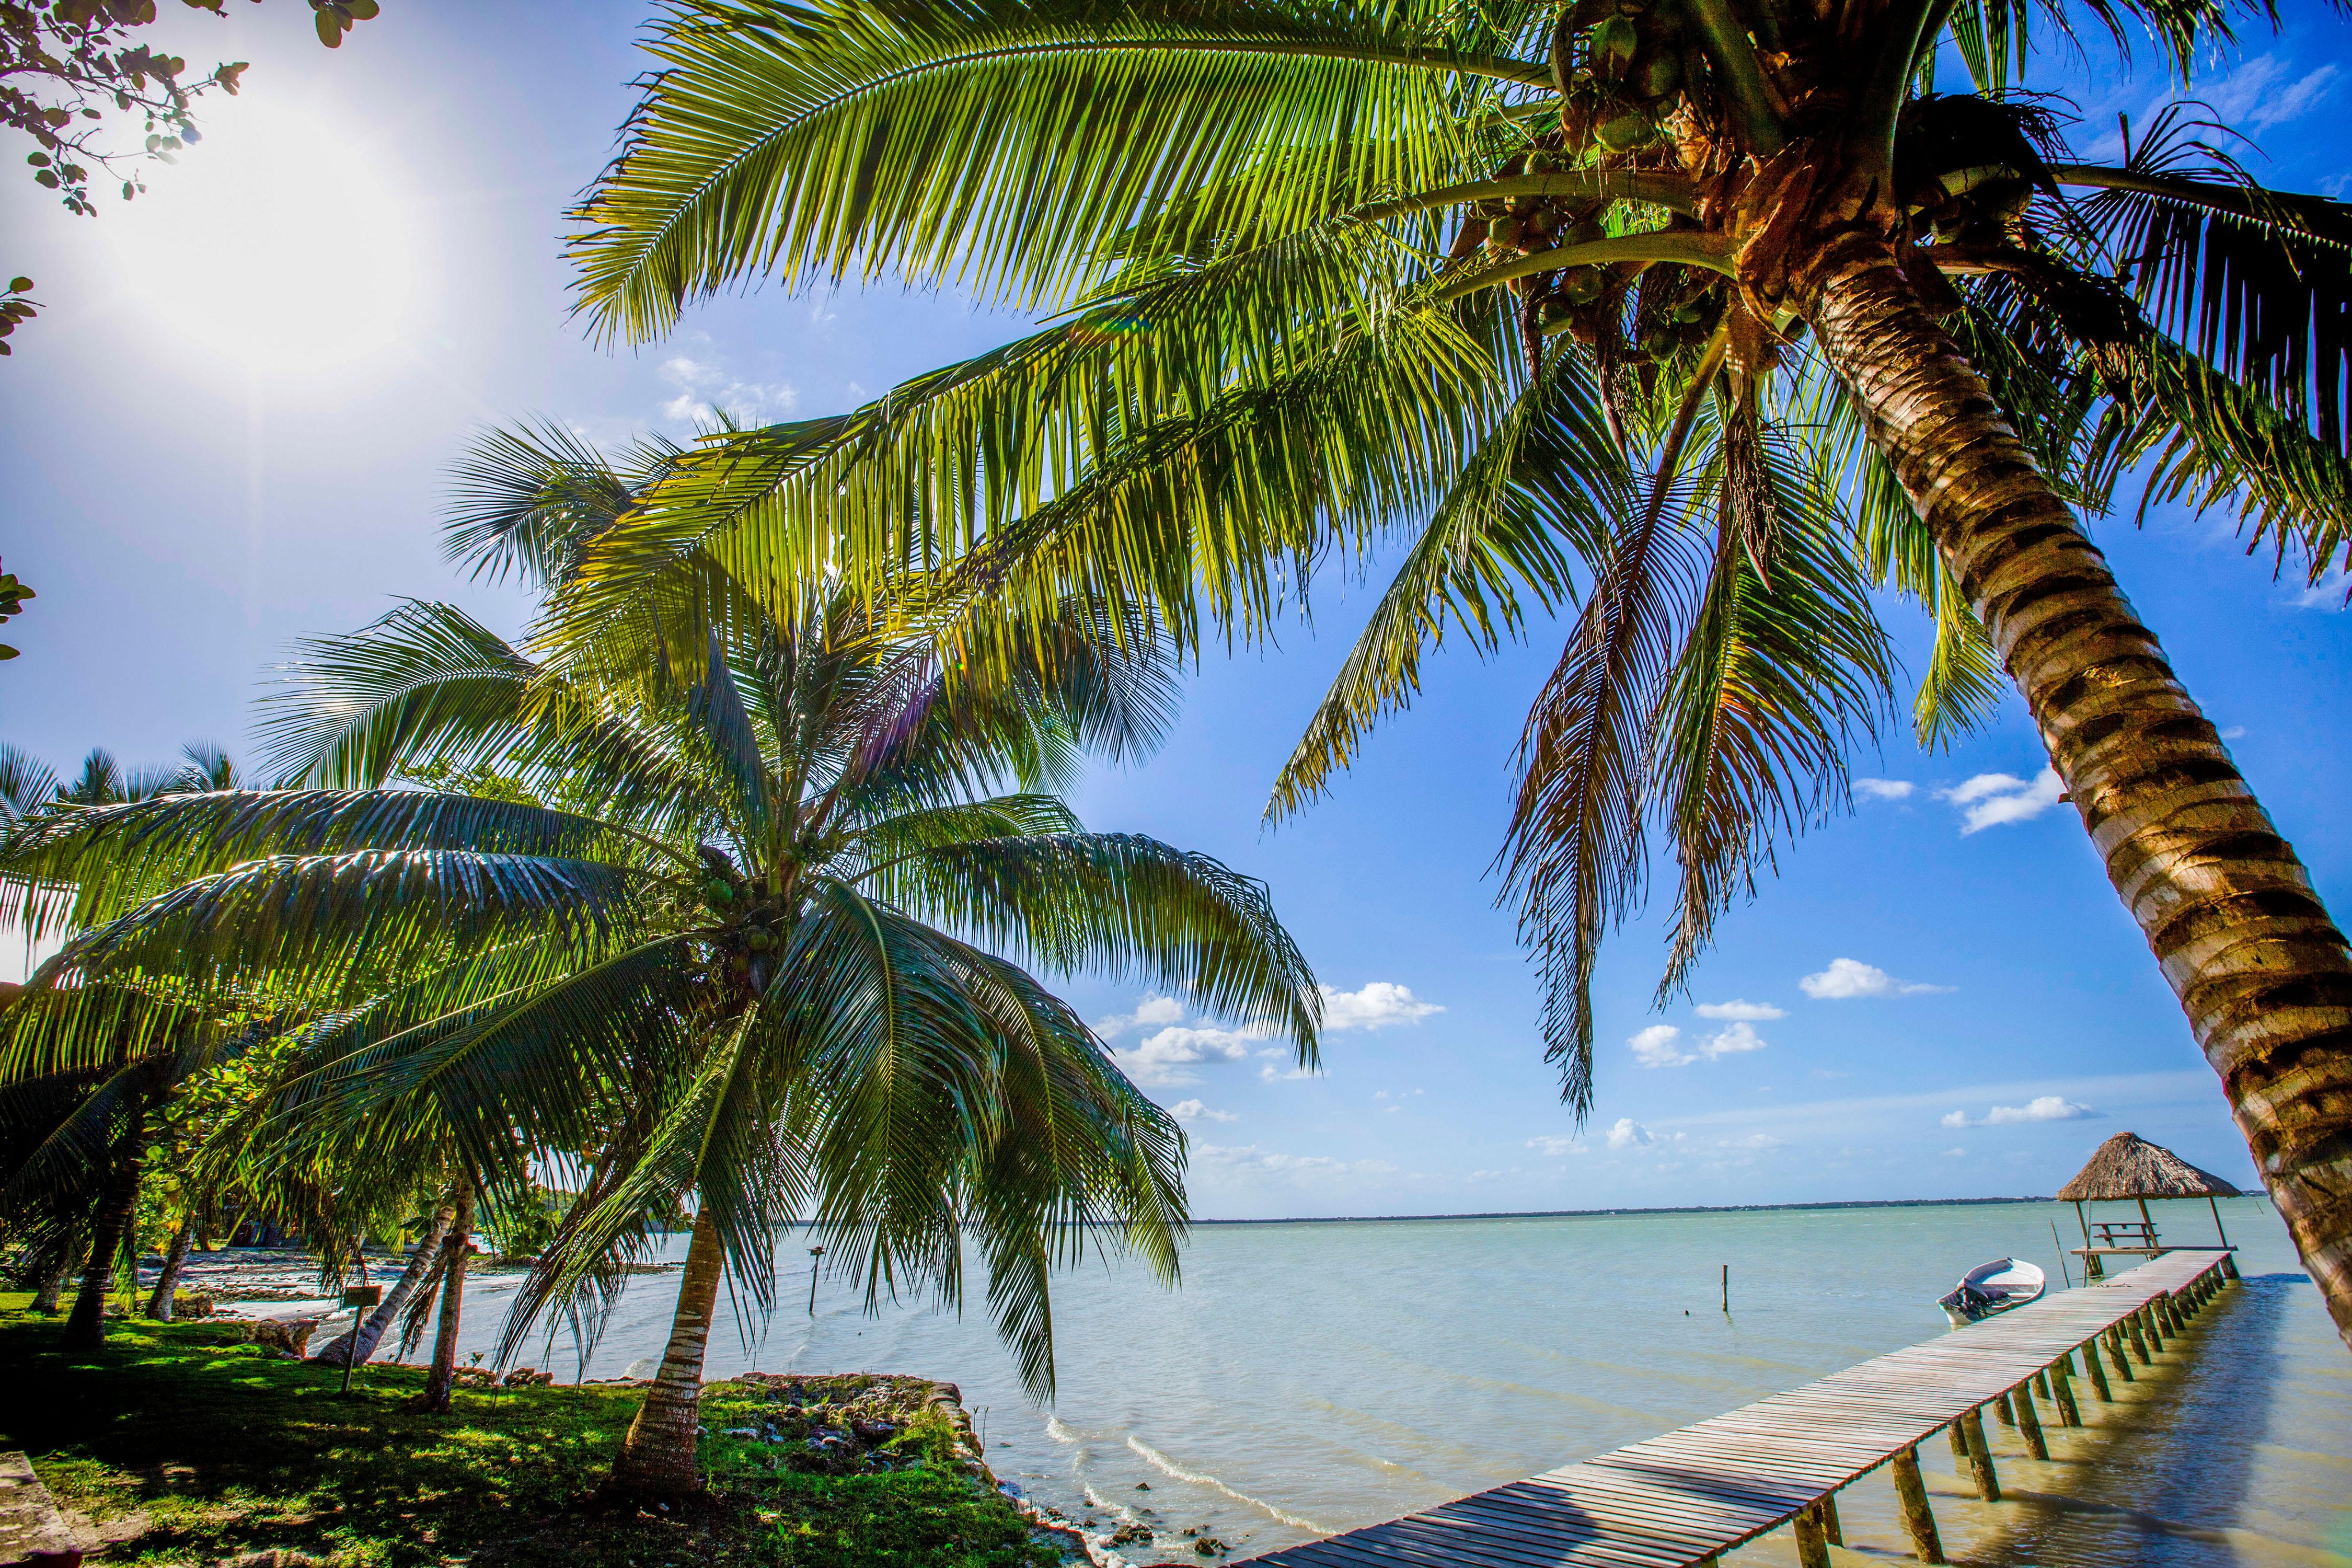 Placencia Beach, Belize